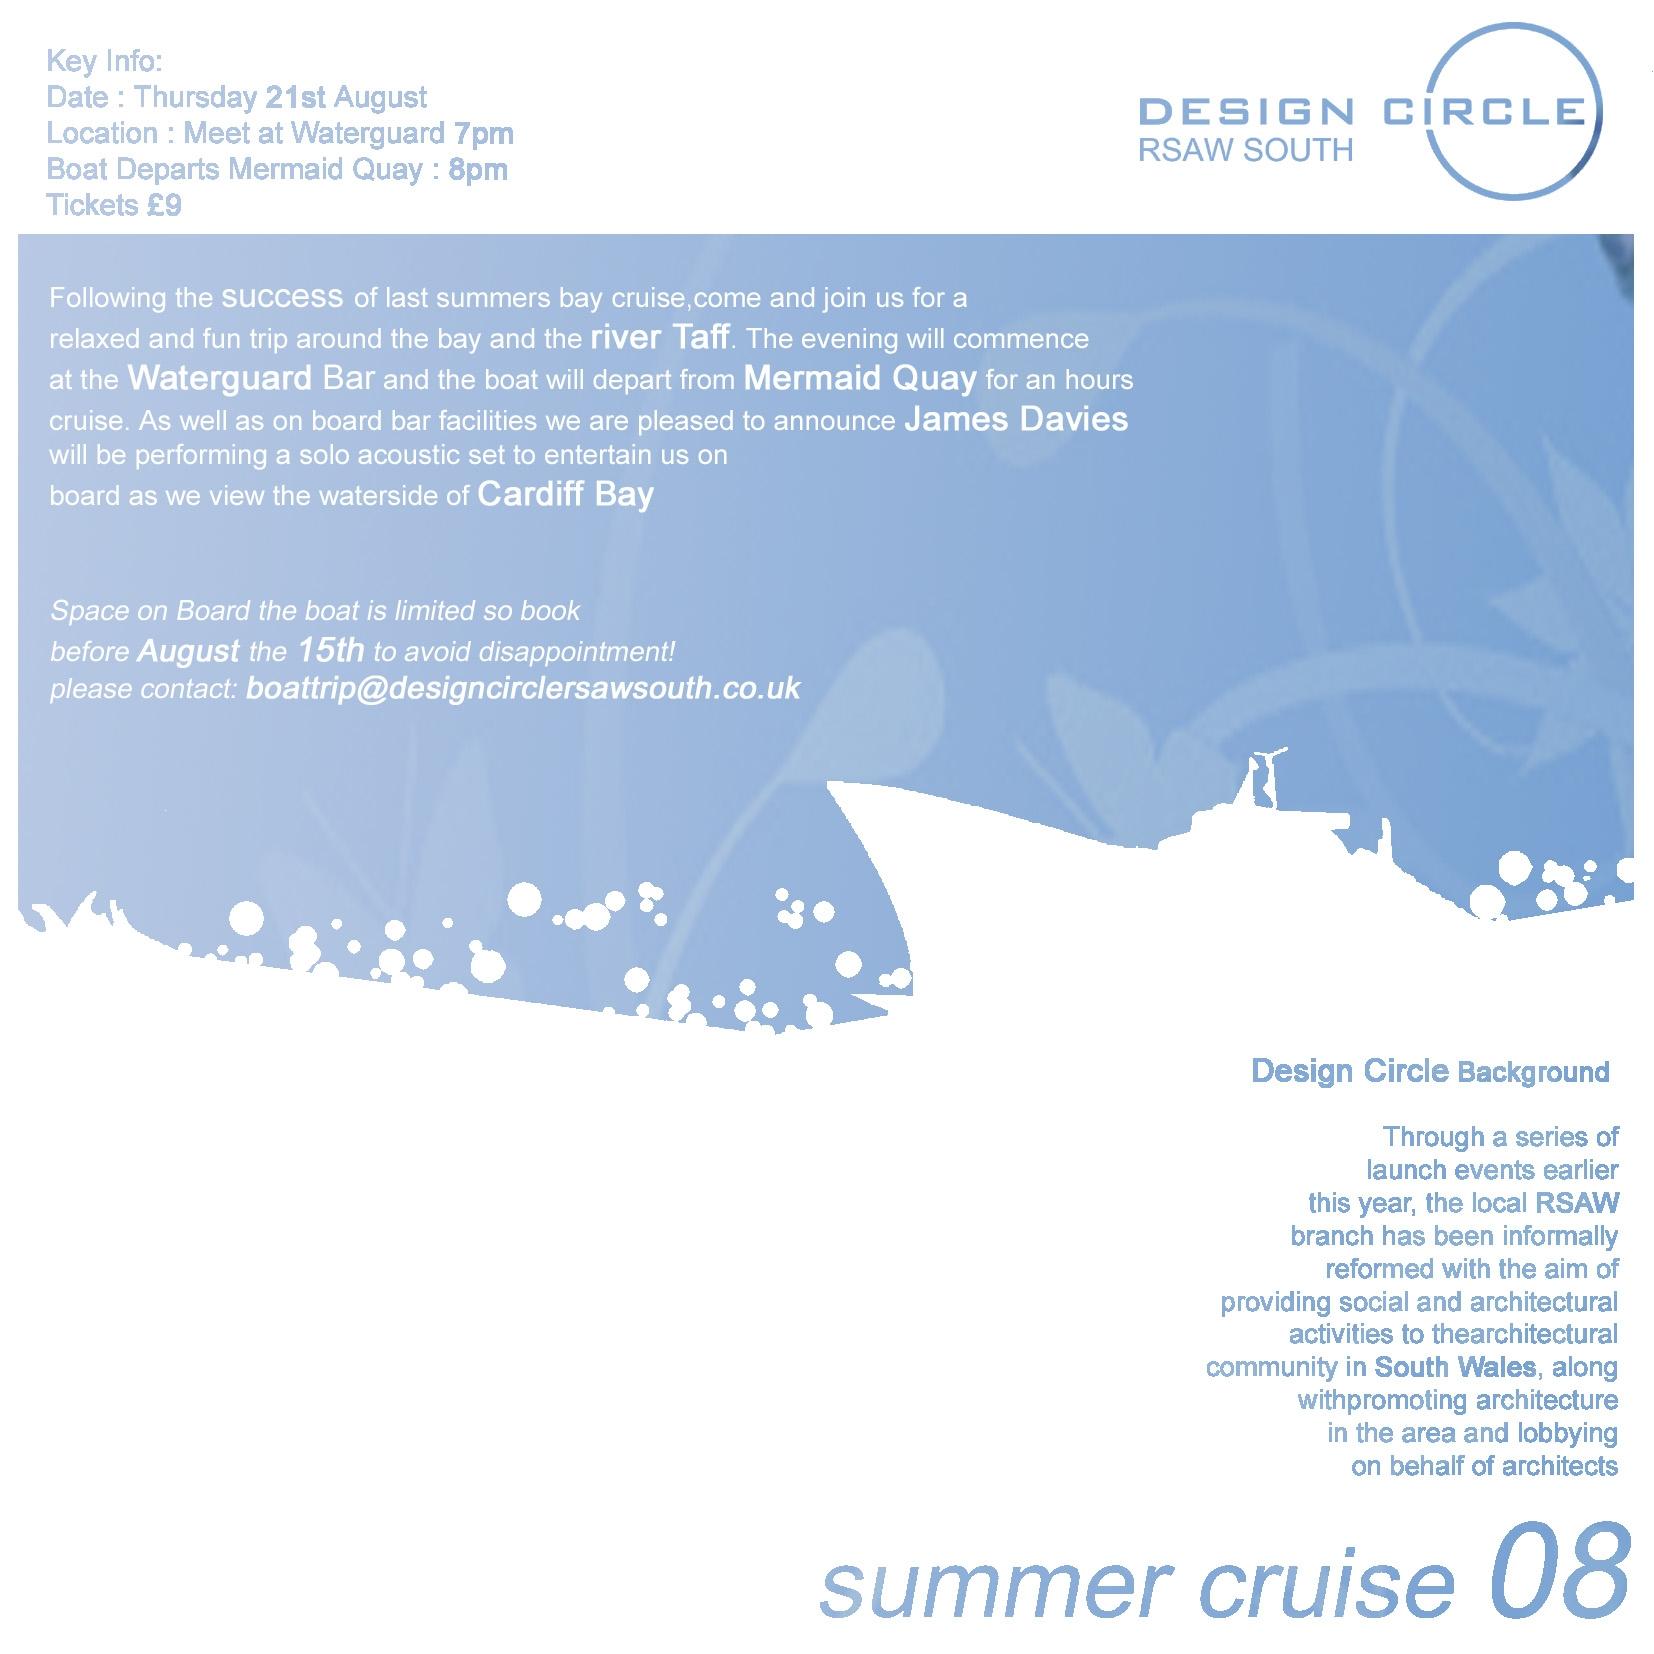 Summer Cruise 2008